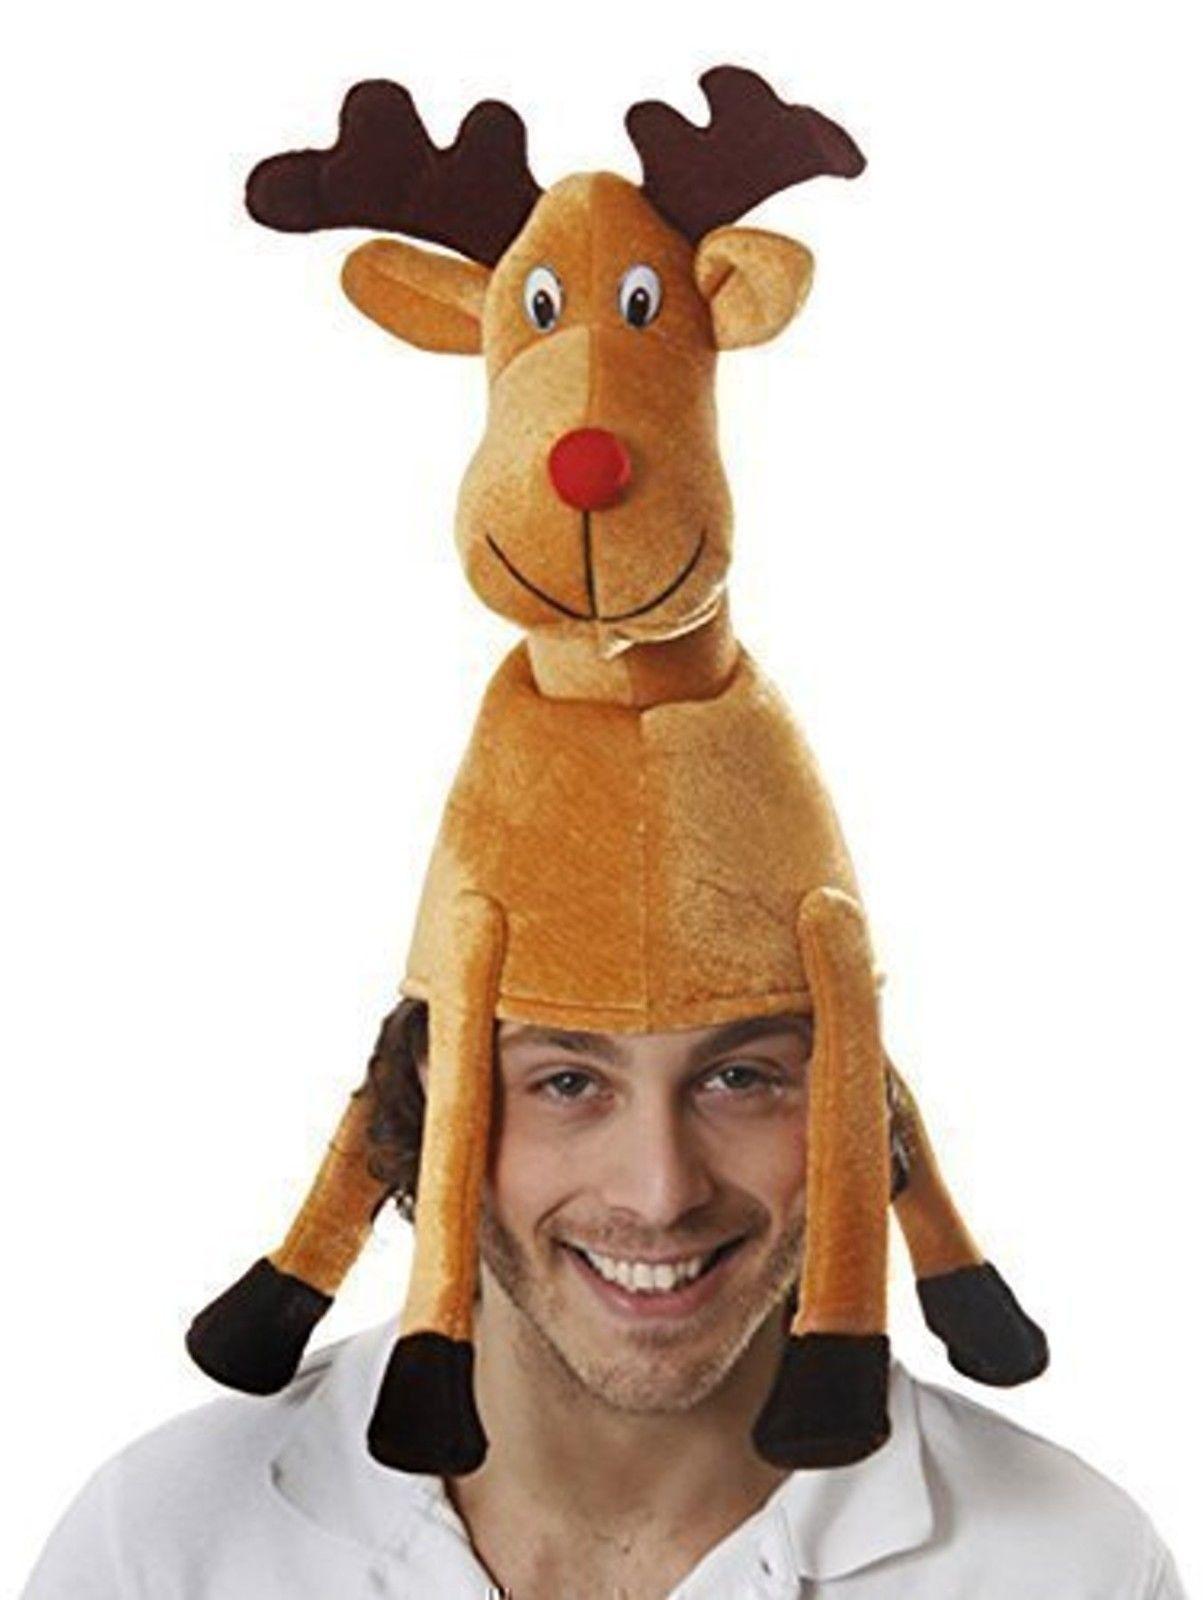 07612ee9624 Christmas Reindeer Adult S Novelty Hat. Christmas Reindeer Adult S Novelty  Hat Novelty Hats